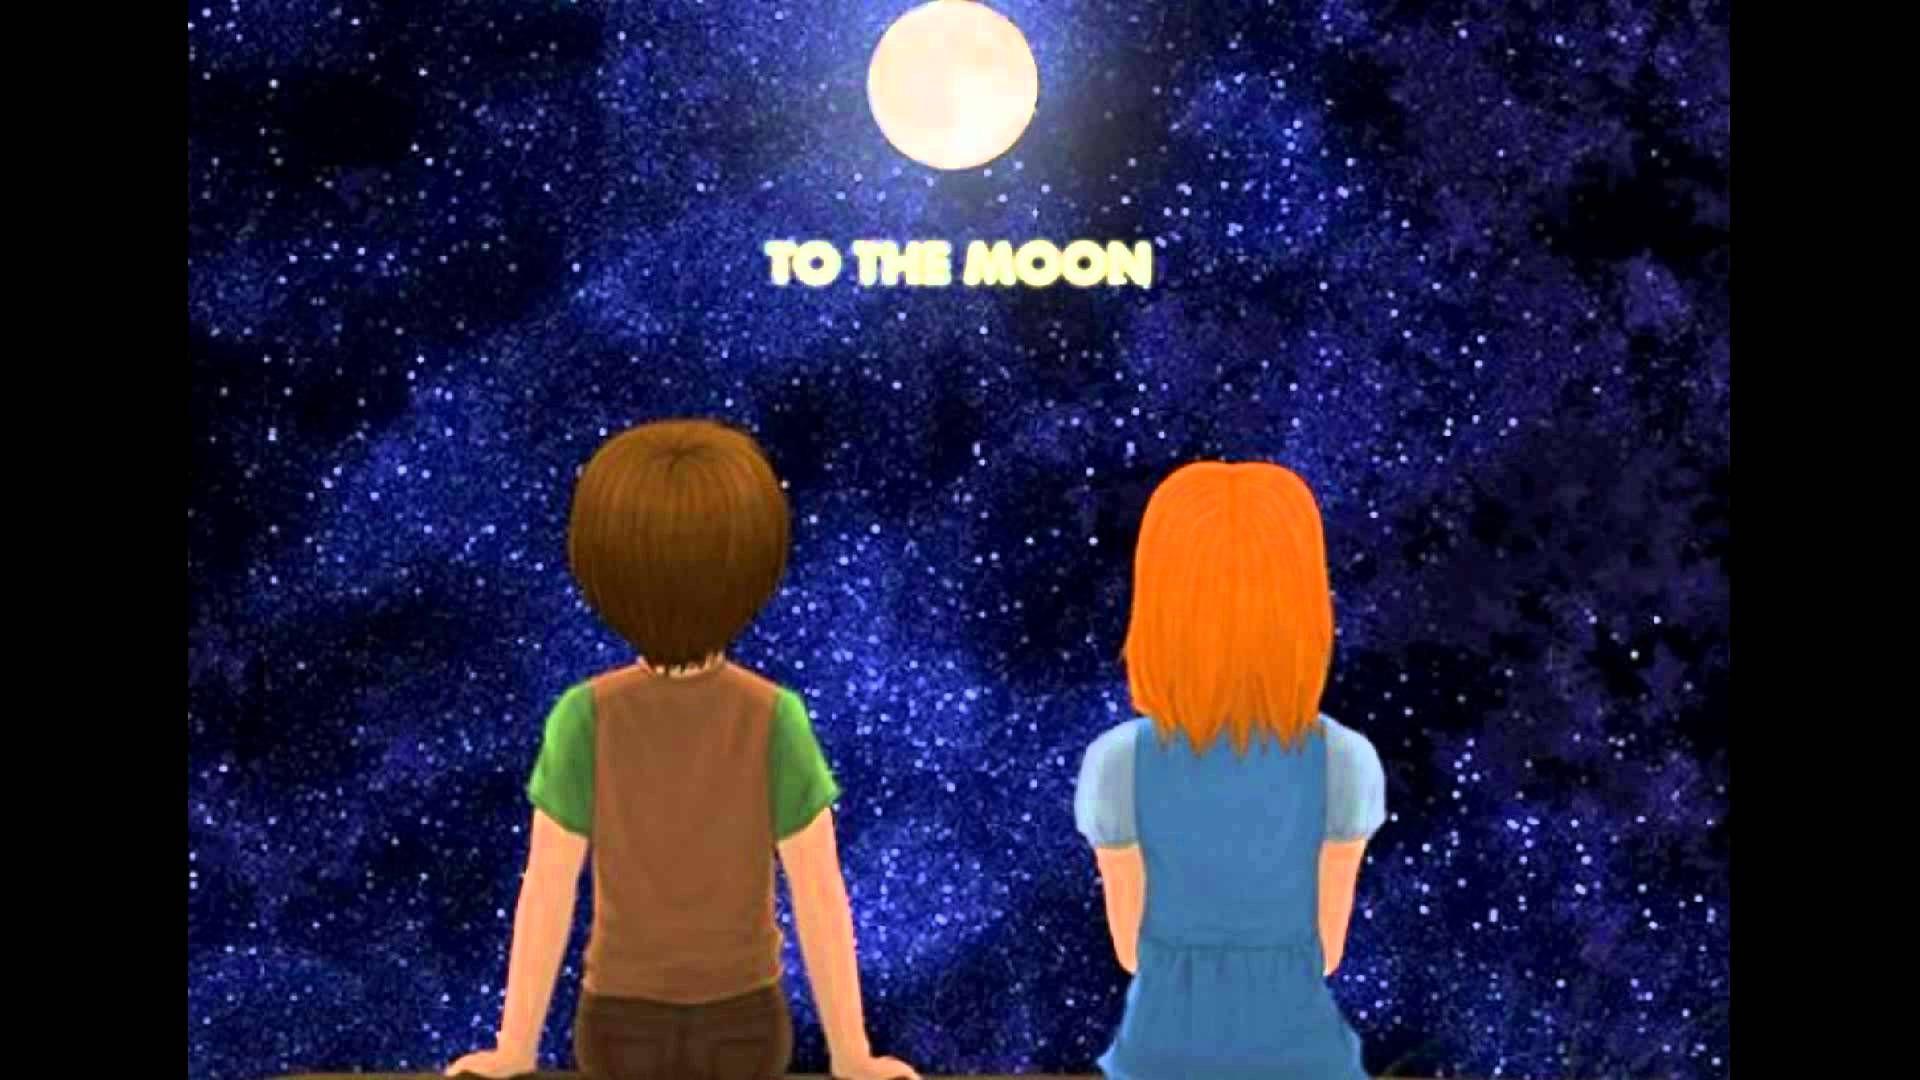 To The Moon Soundtrack Full Album Art Music Movie Soundtracks Soundtrack